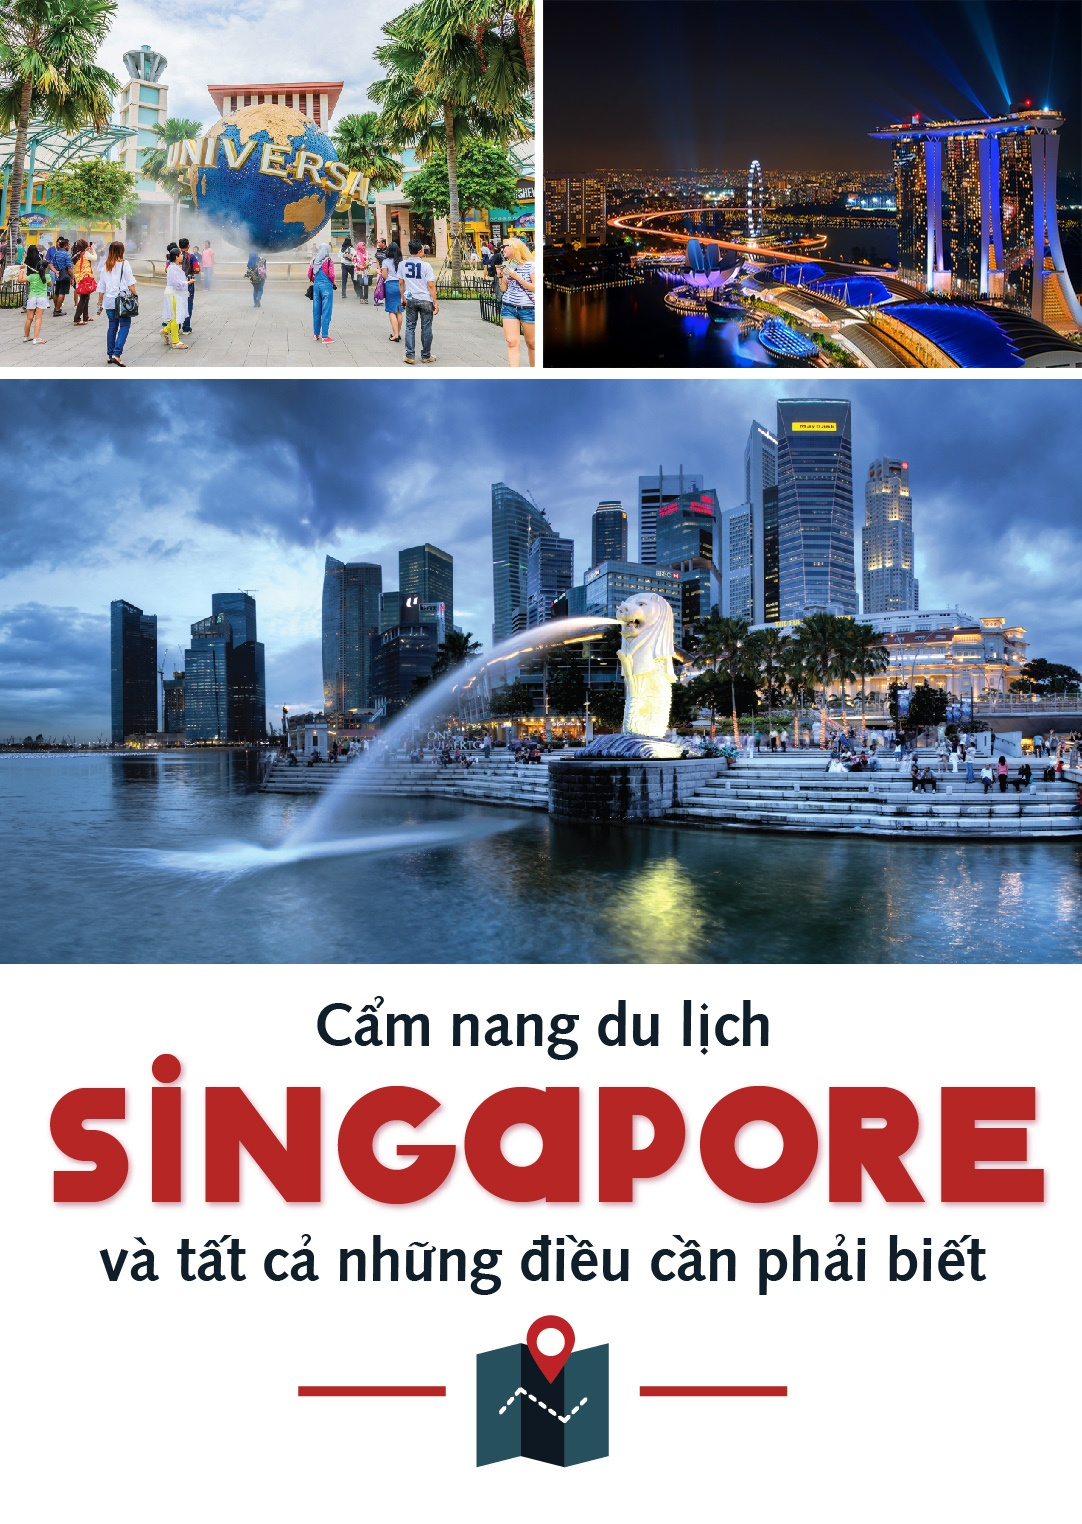 Du lich tu tuc Singapore va tat ca kinh nghiem phai biet hinh anh 1